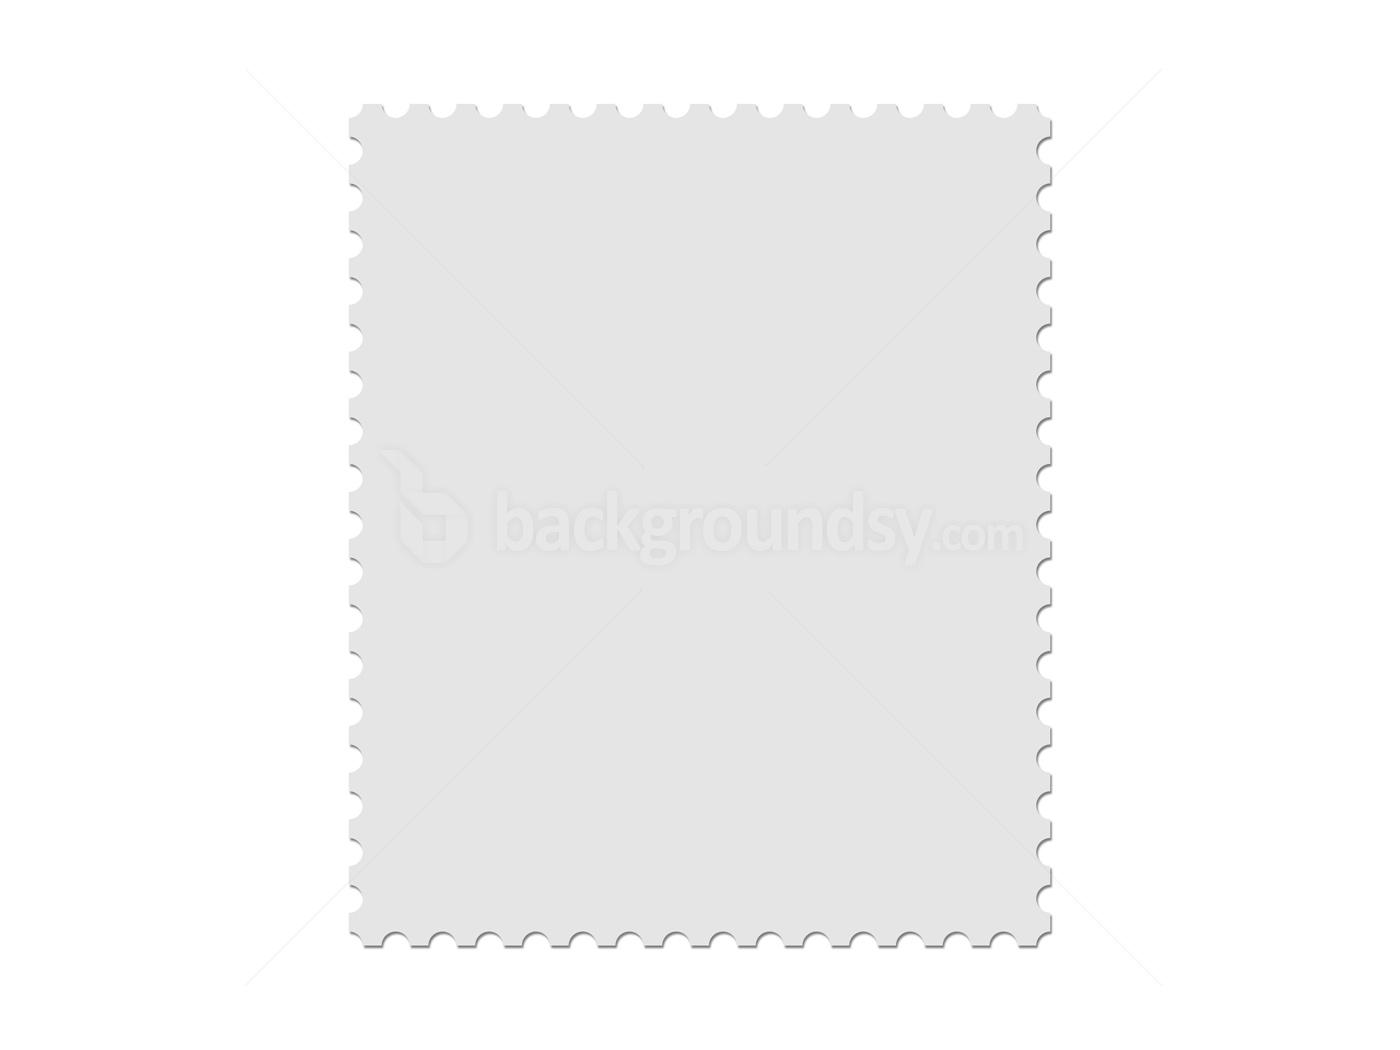 blank postage stamp backgroundsy com